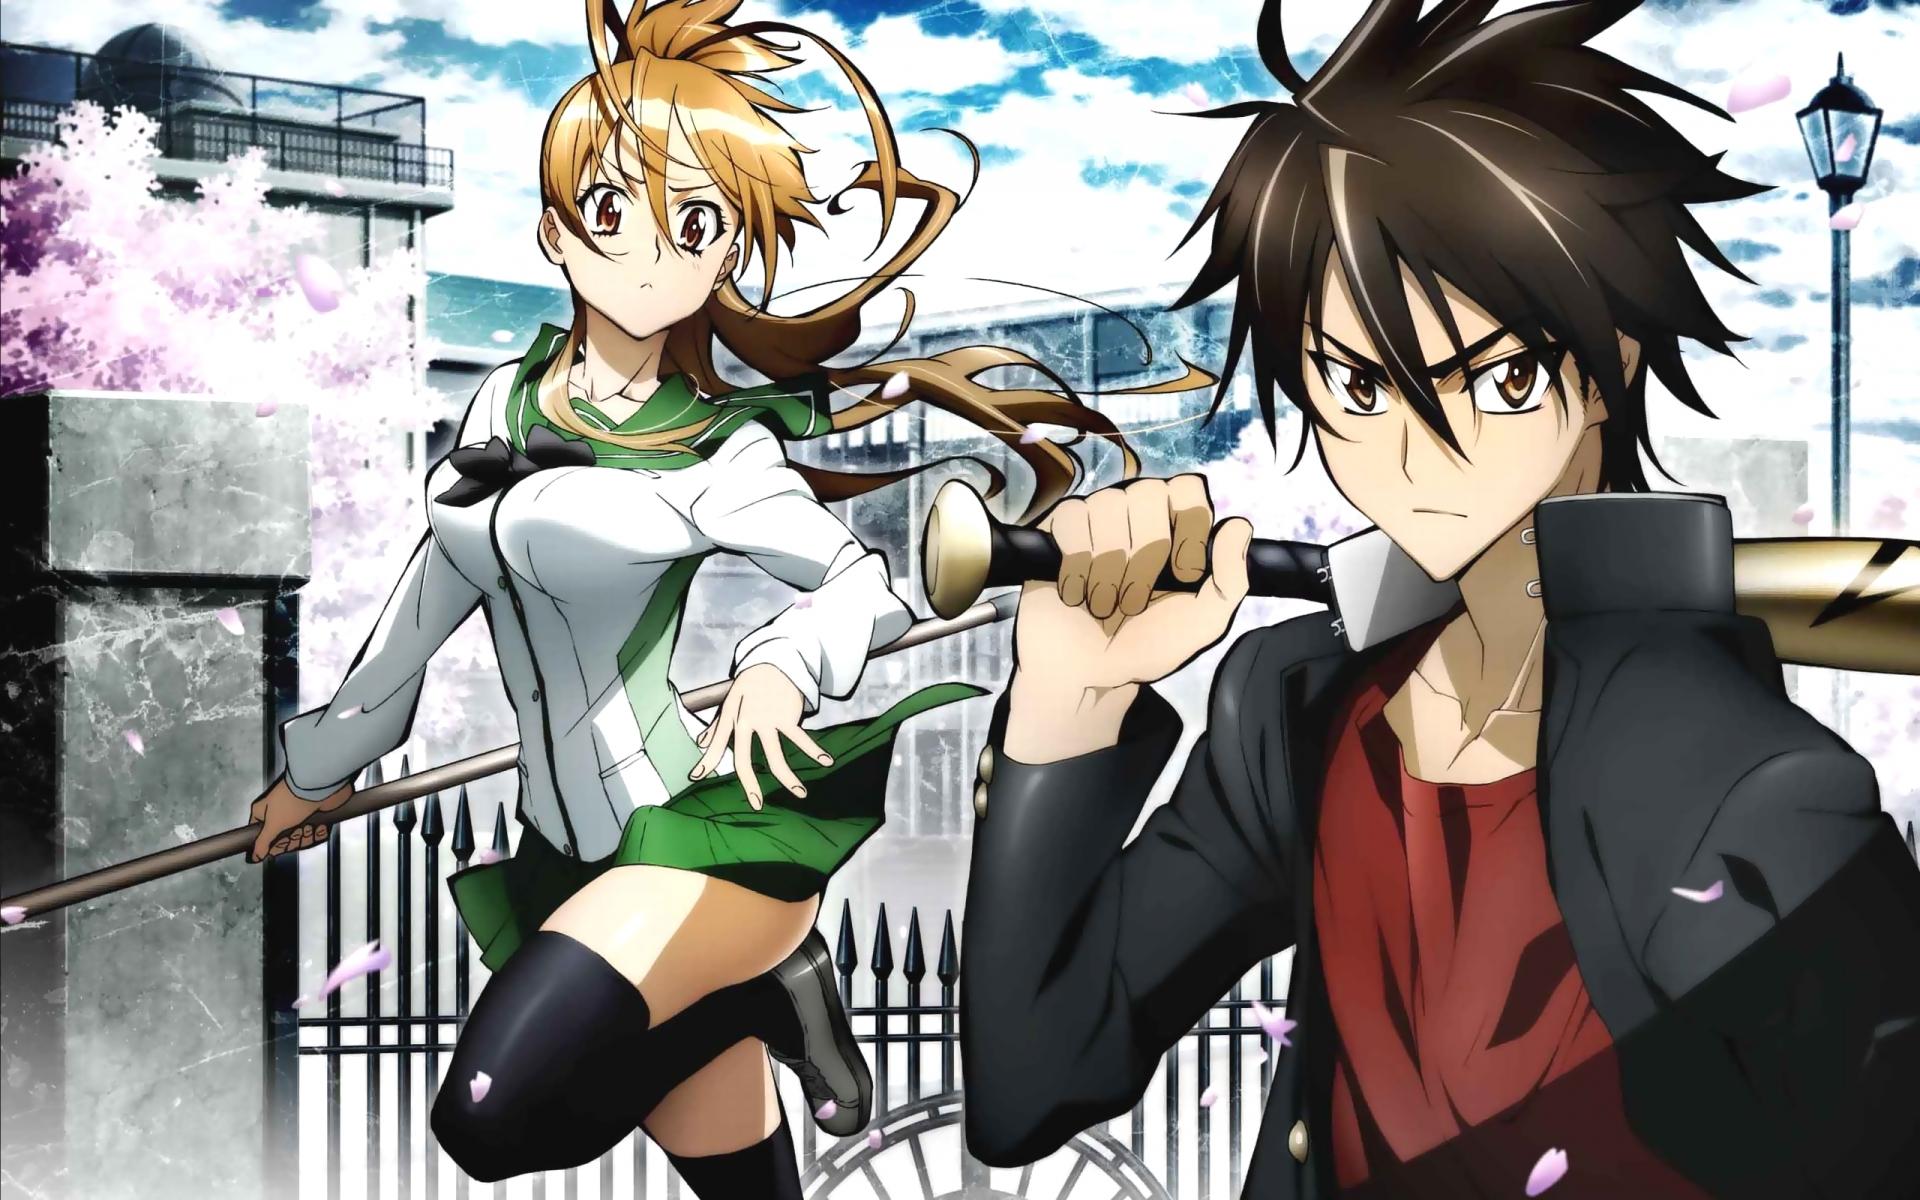 highschool_of_the_dead komuro_takashi miyamoto_rei petals school_uniform thighhighs weapon